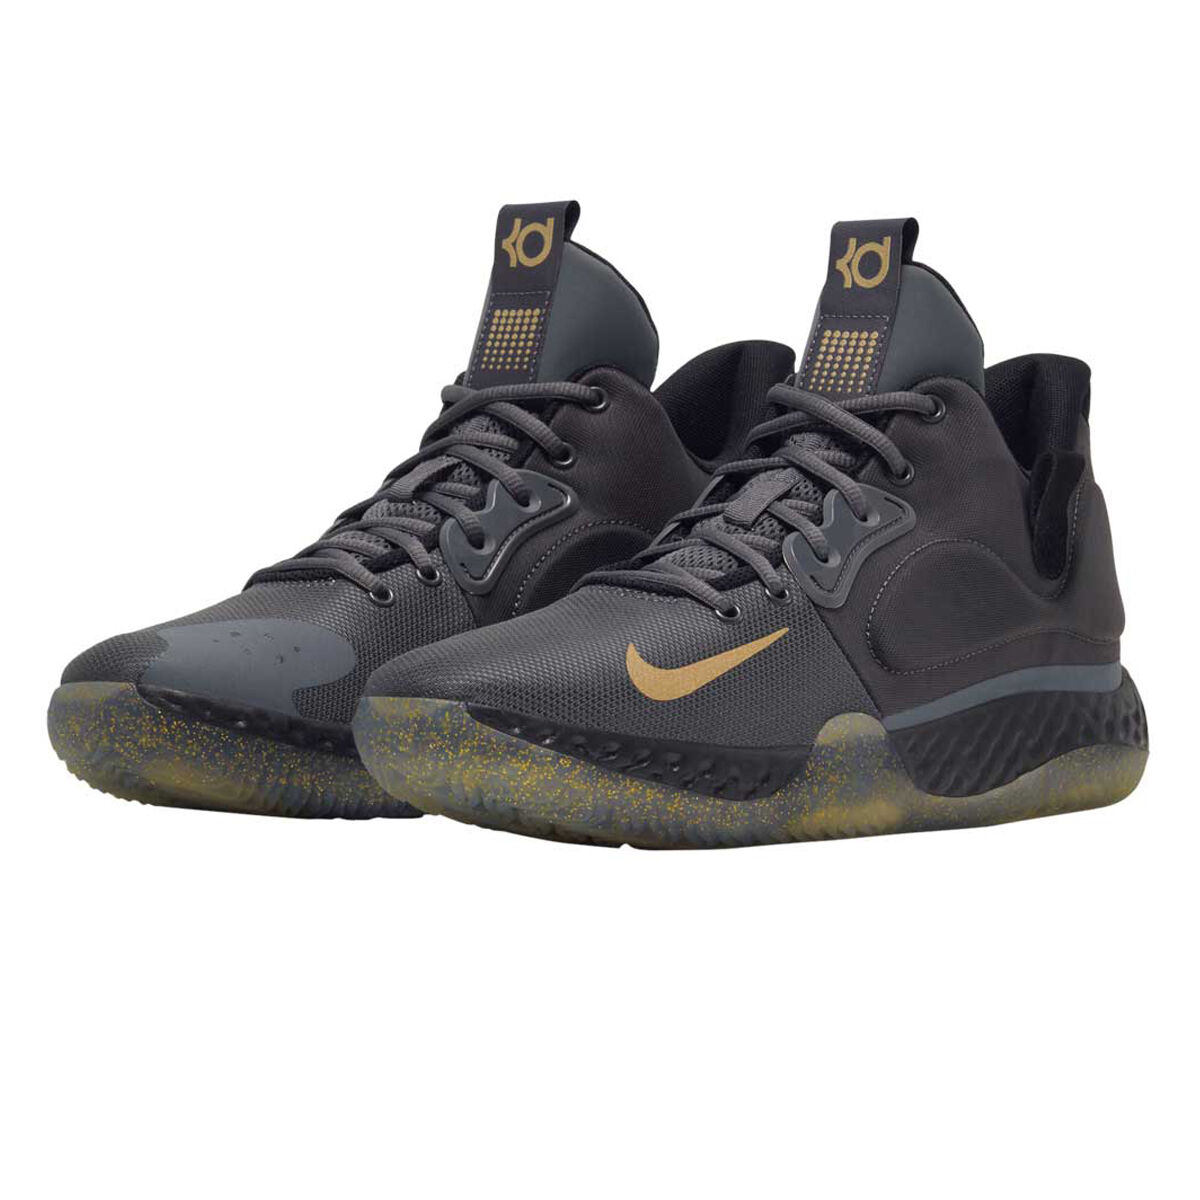 VII Mens Basketball Shoes Grey / Gold